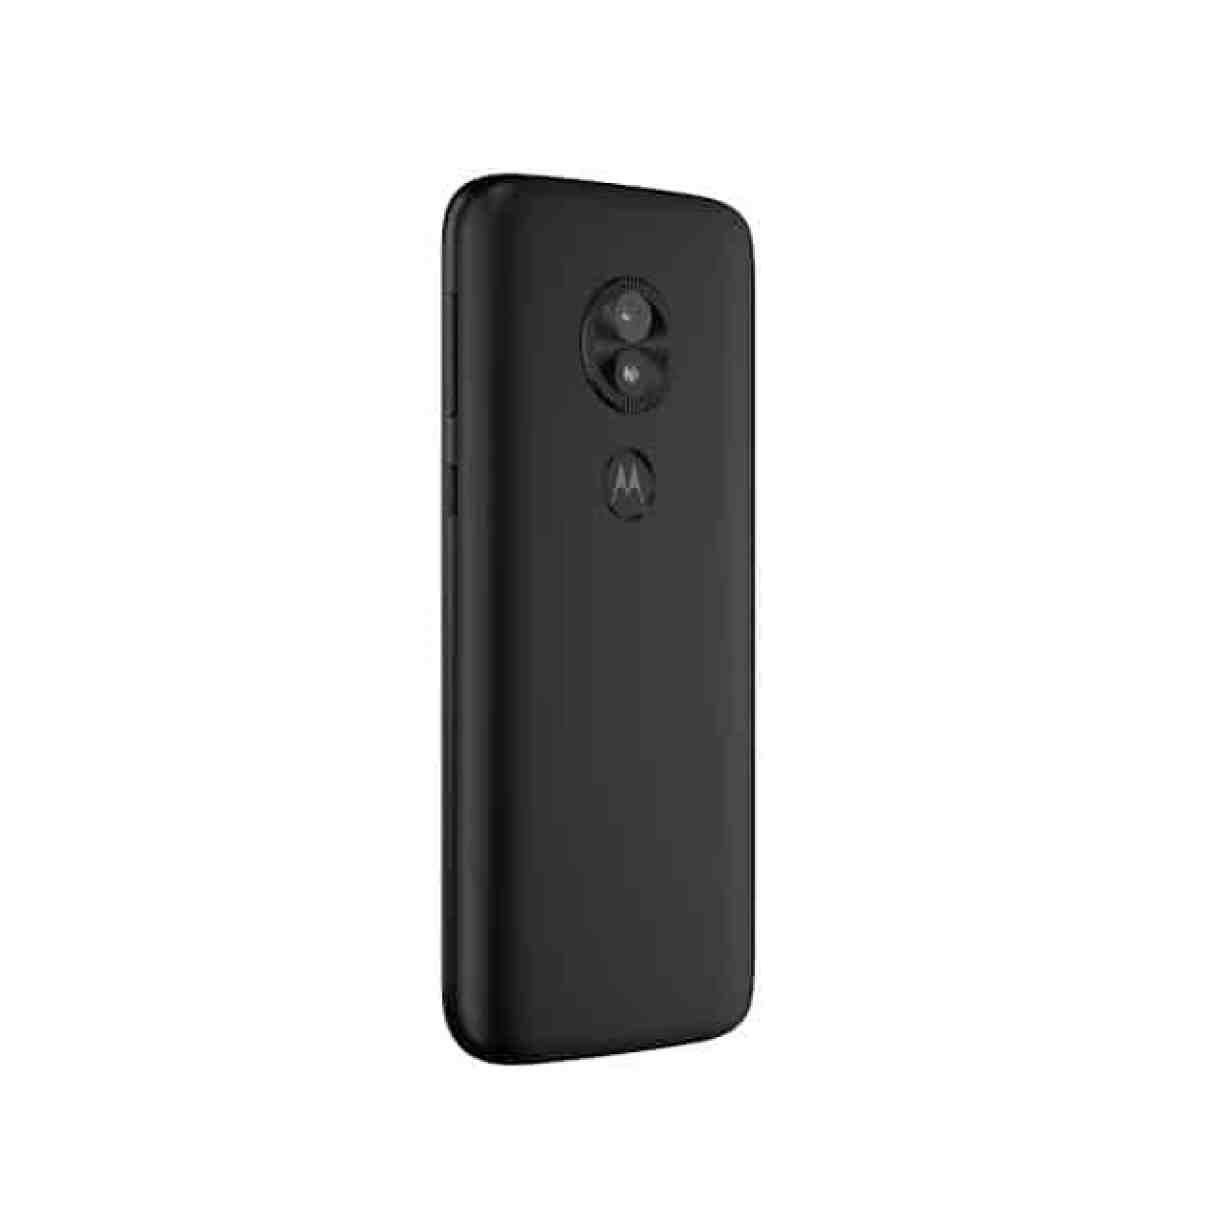 - MotoE5Play ROW Black DYNBACKSIDERIGHT 1 - moto e5 play โทรศัพท์มือถือ Android Go จอใหญ่ มีสแกนลายนิ้วมือ ในราคาเพียง 2,888 บาท